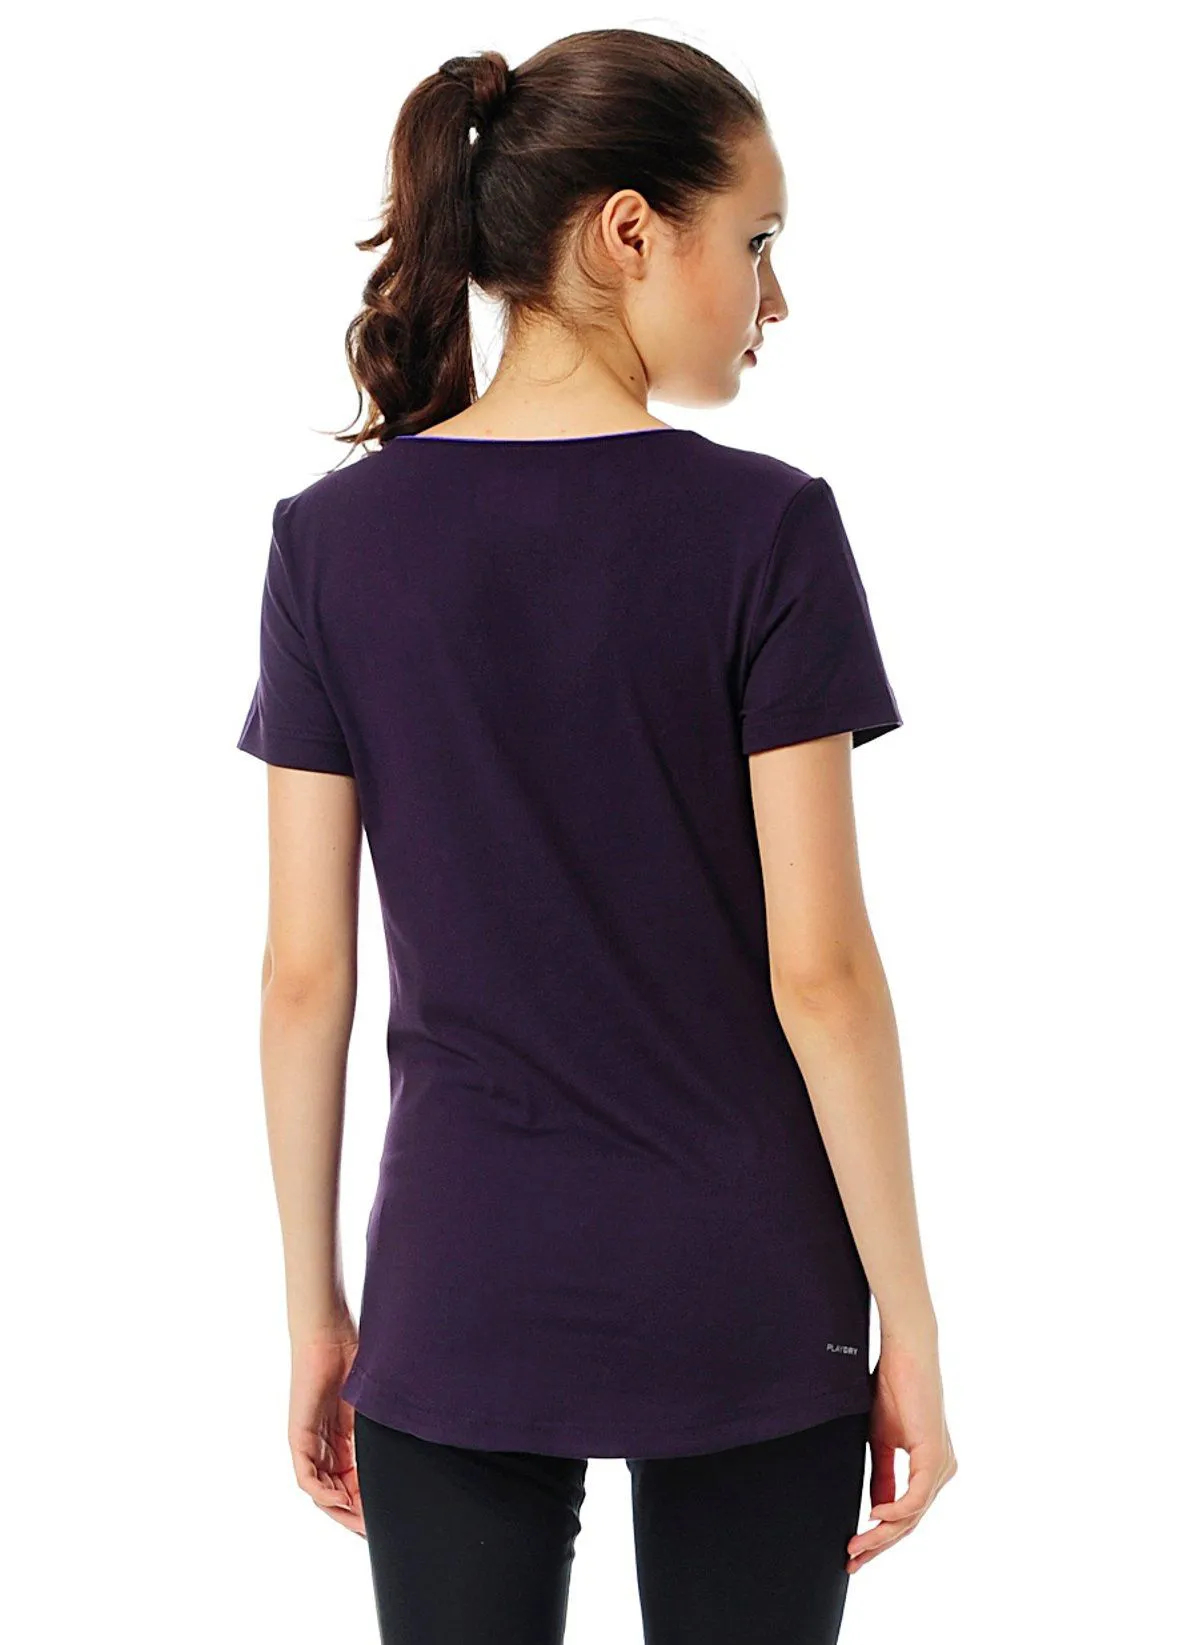 Camiseta Feminina Reebok Classic Running Fitness Crossfit